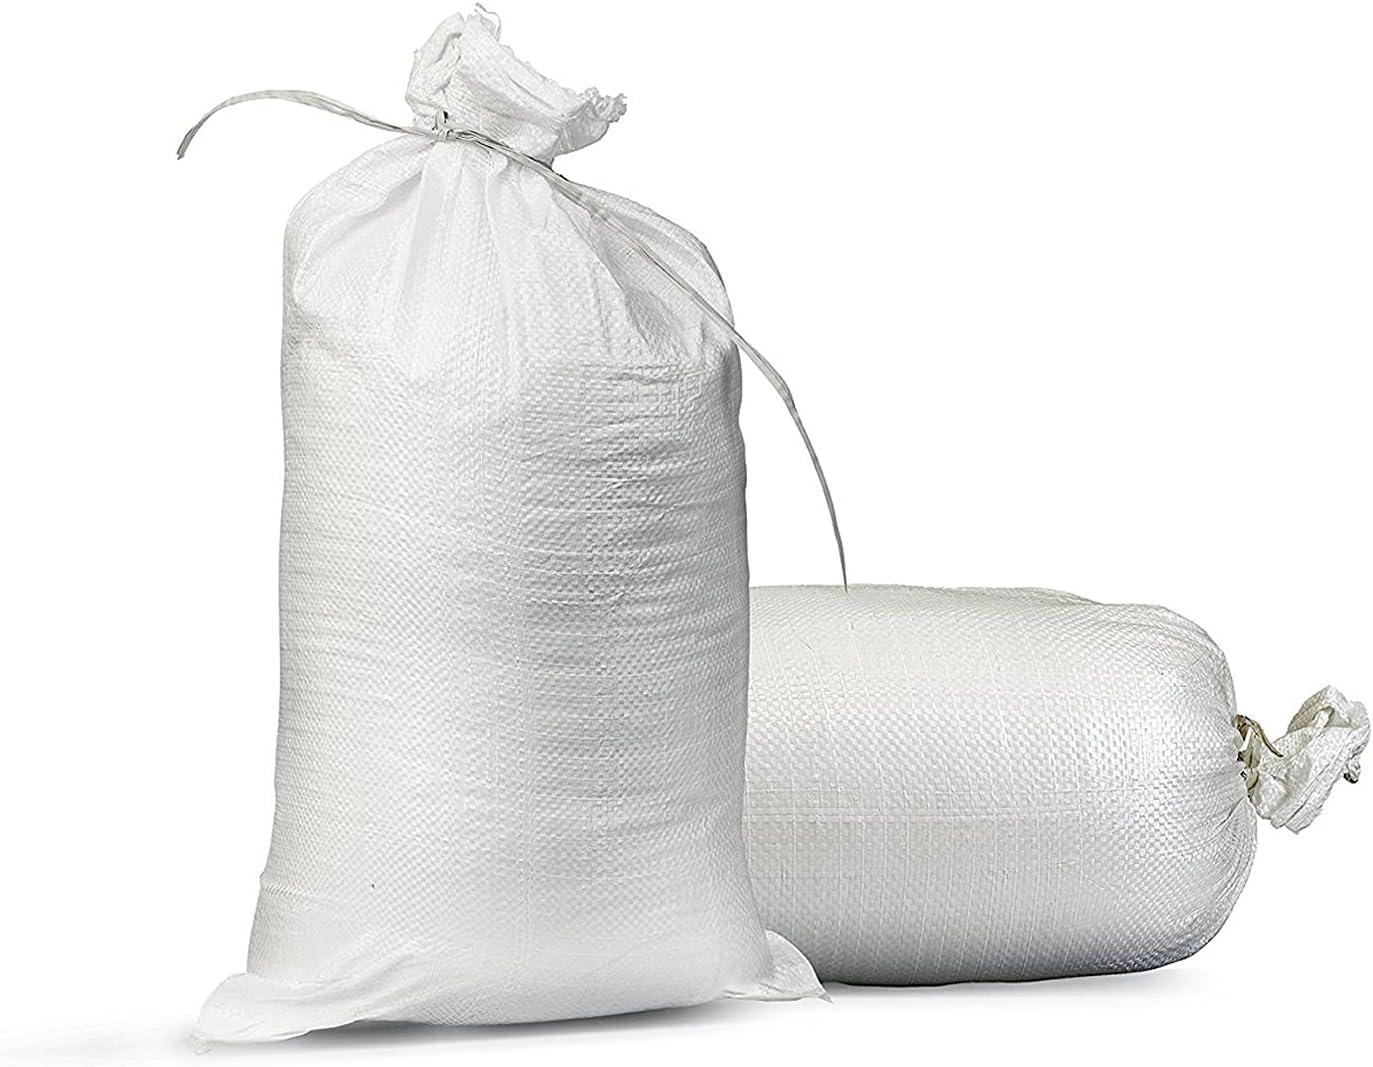 Empty White Sandbags with Ties (Bundle of 10) 14